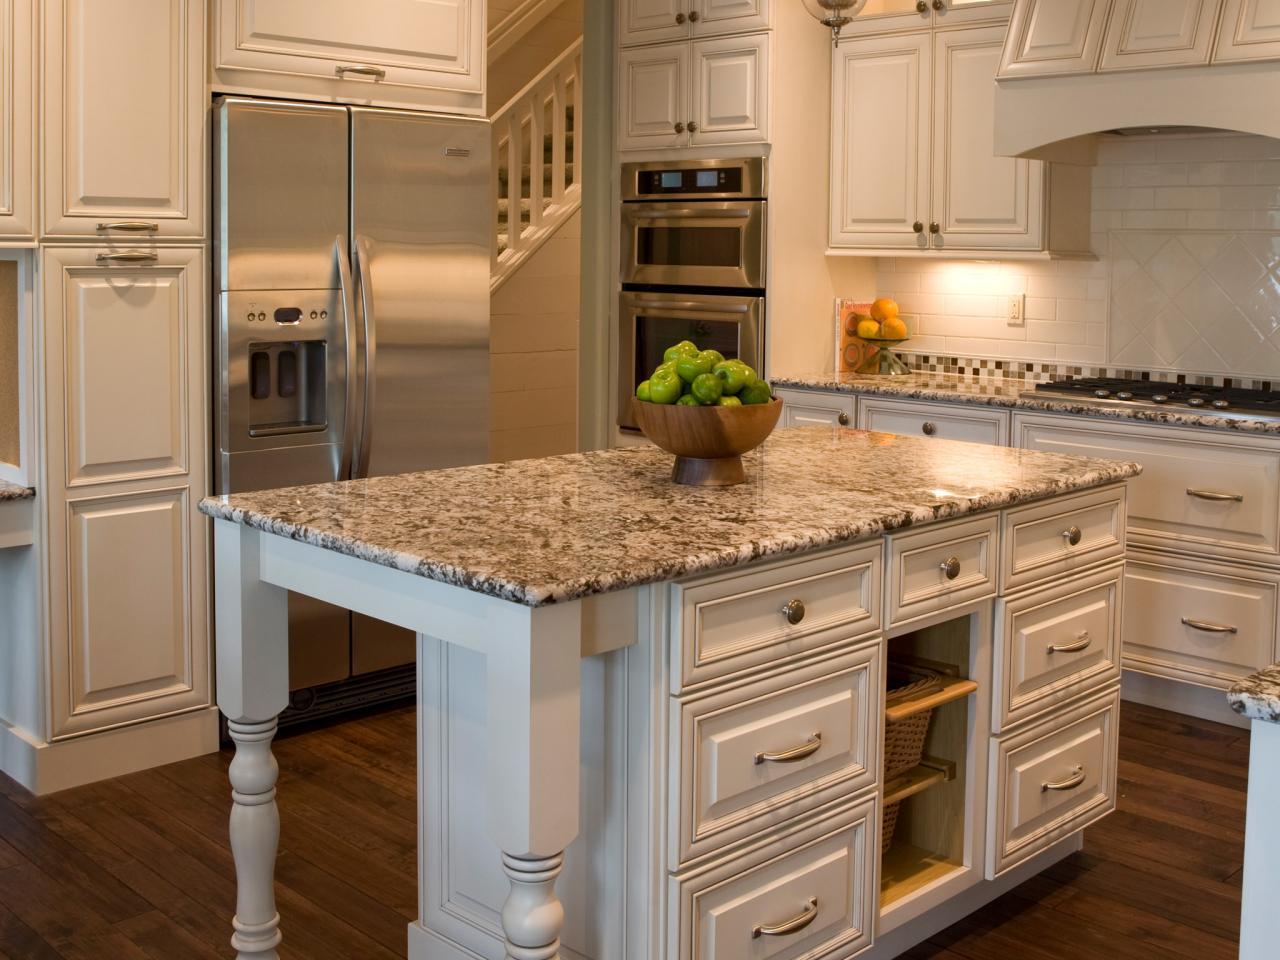 granite kitchen designs photo - 3